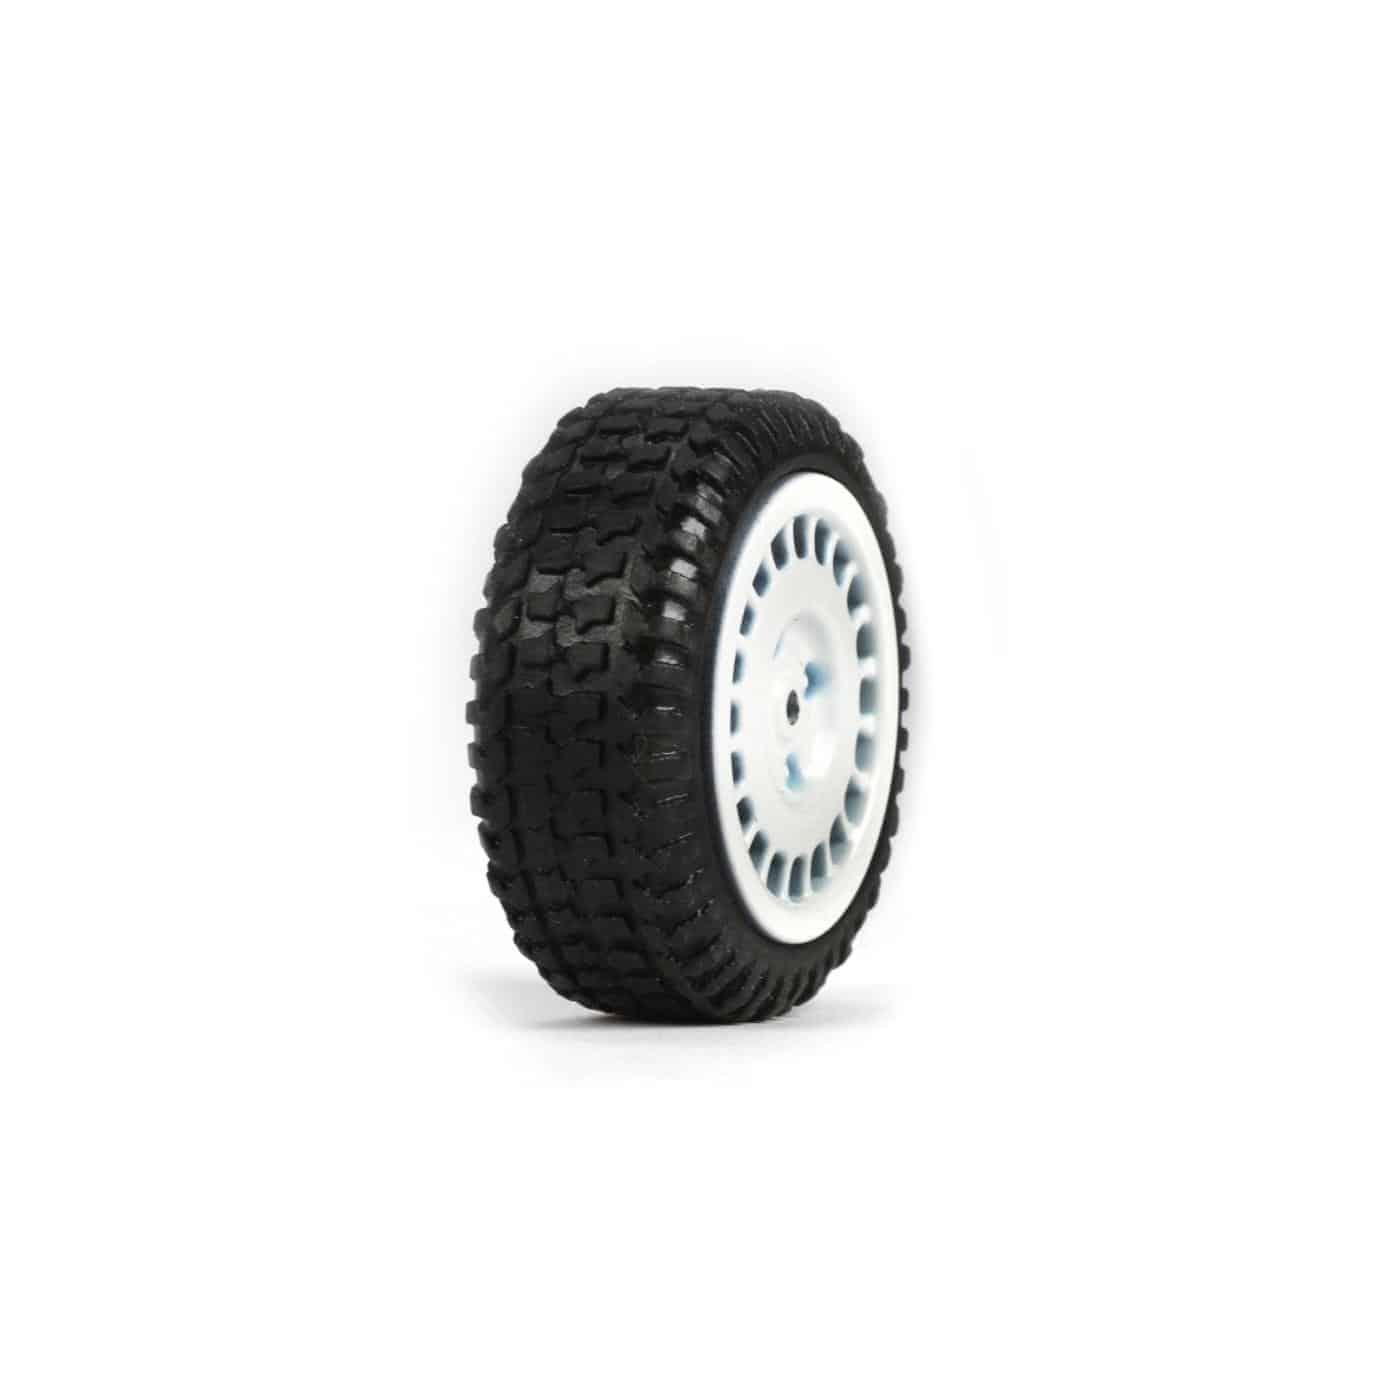 Tires, Mounted, White (4): Micro Rally